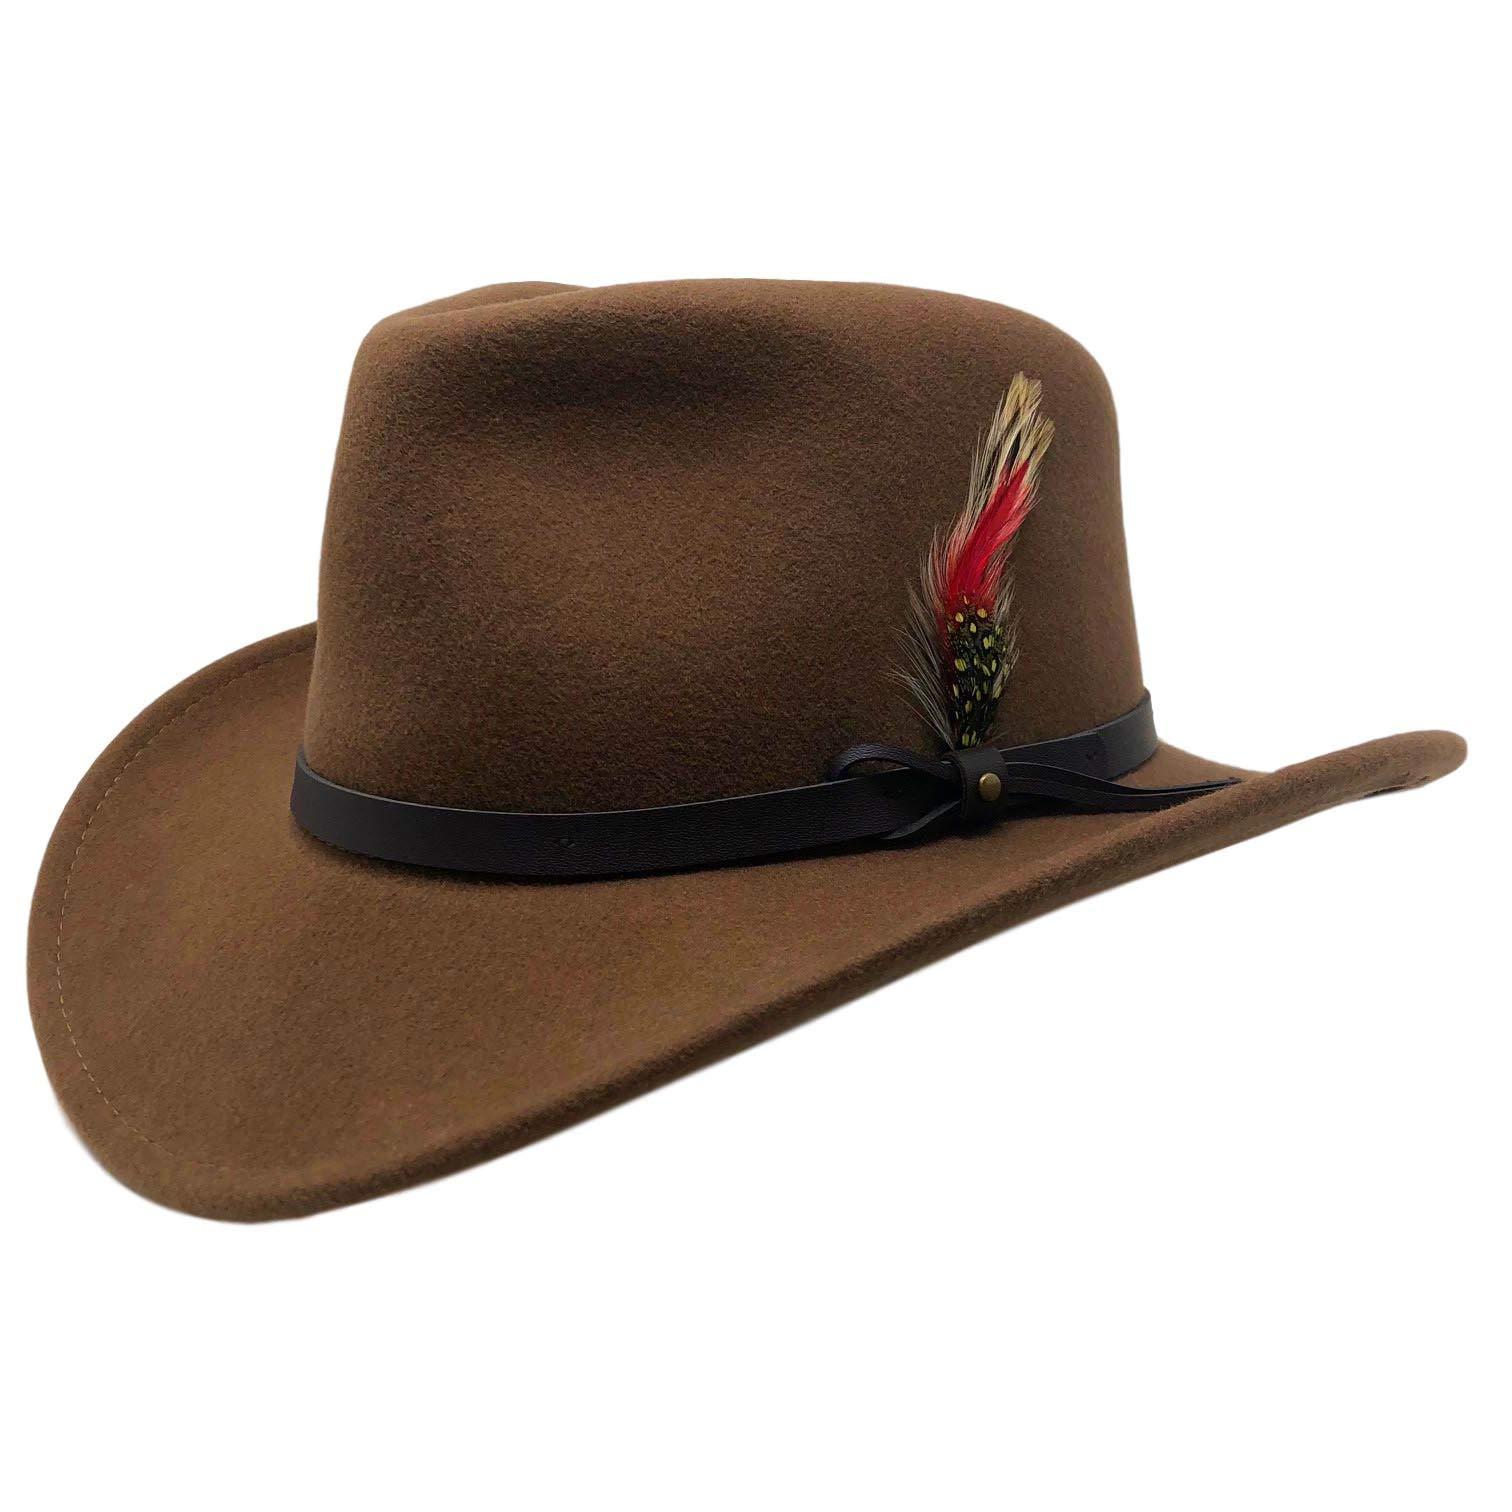 Bellamora One Fresh Hat Wool Felt Crushable Outback Fedora Water Repellent Indy Jones Style Hat